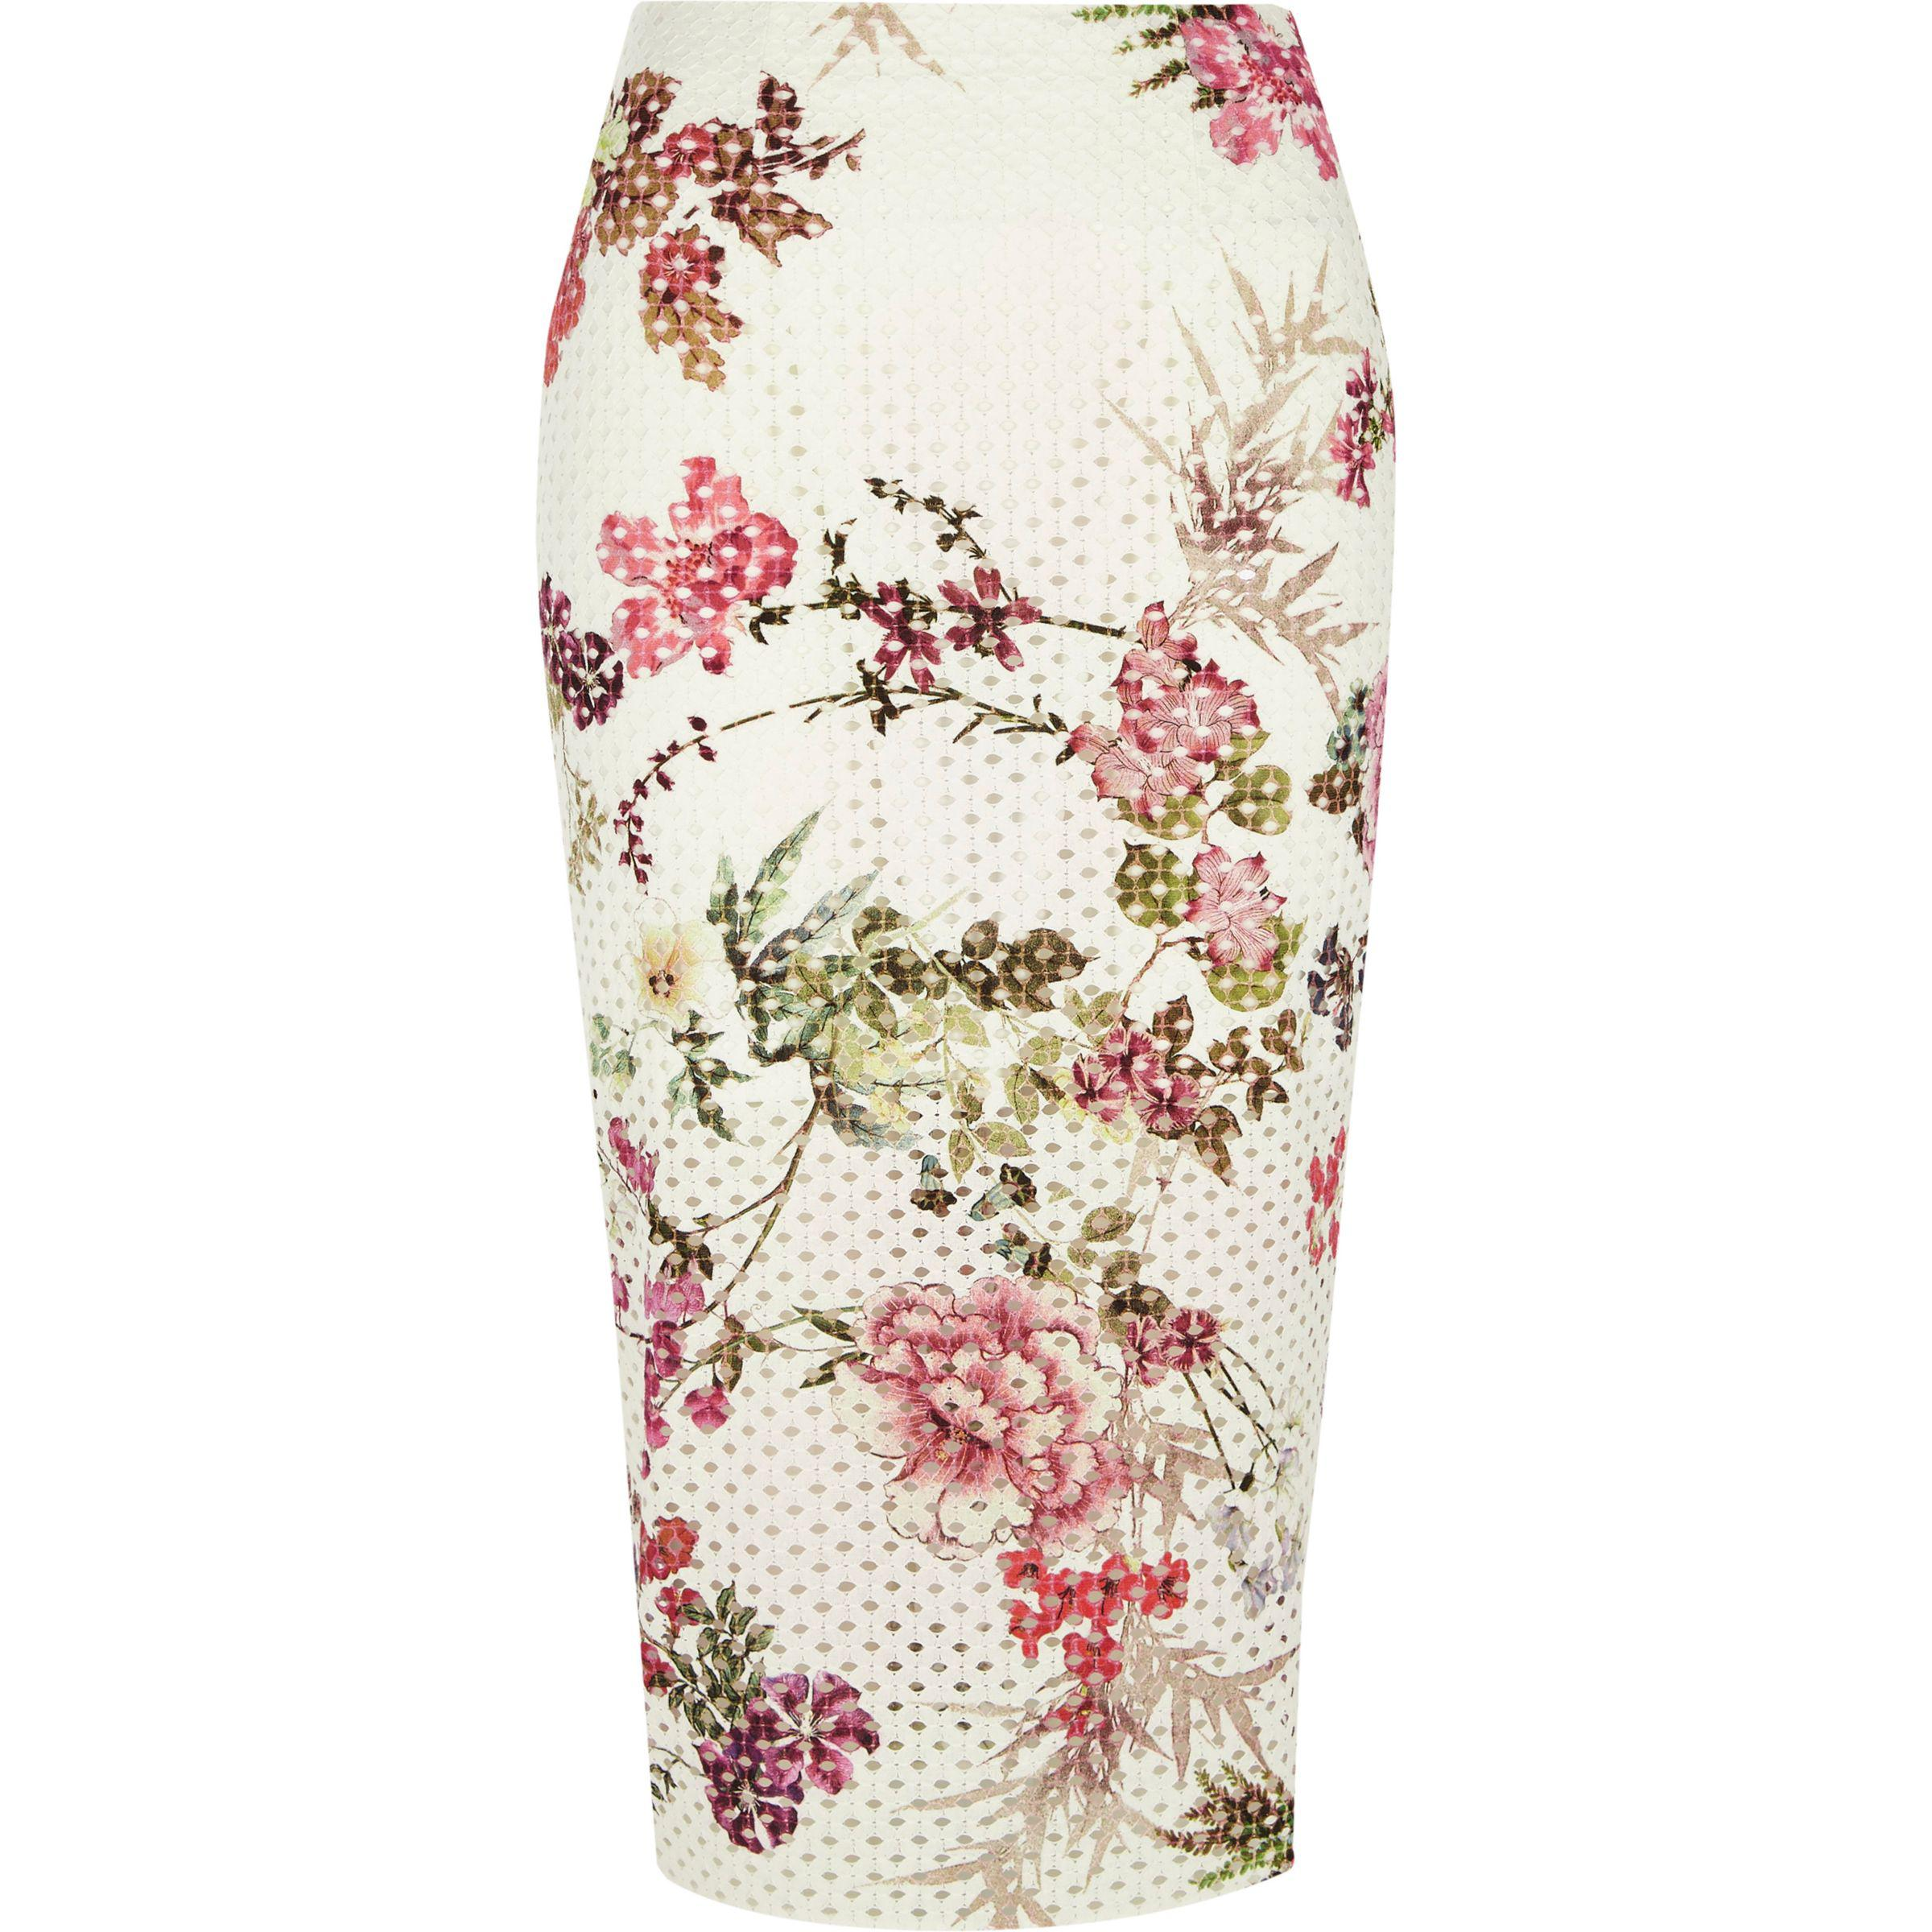 a0d55d80ed River Island White Floral Laser Cut Midi Pencil Skirt in White - Lyst